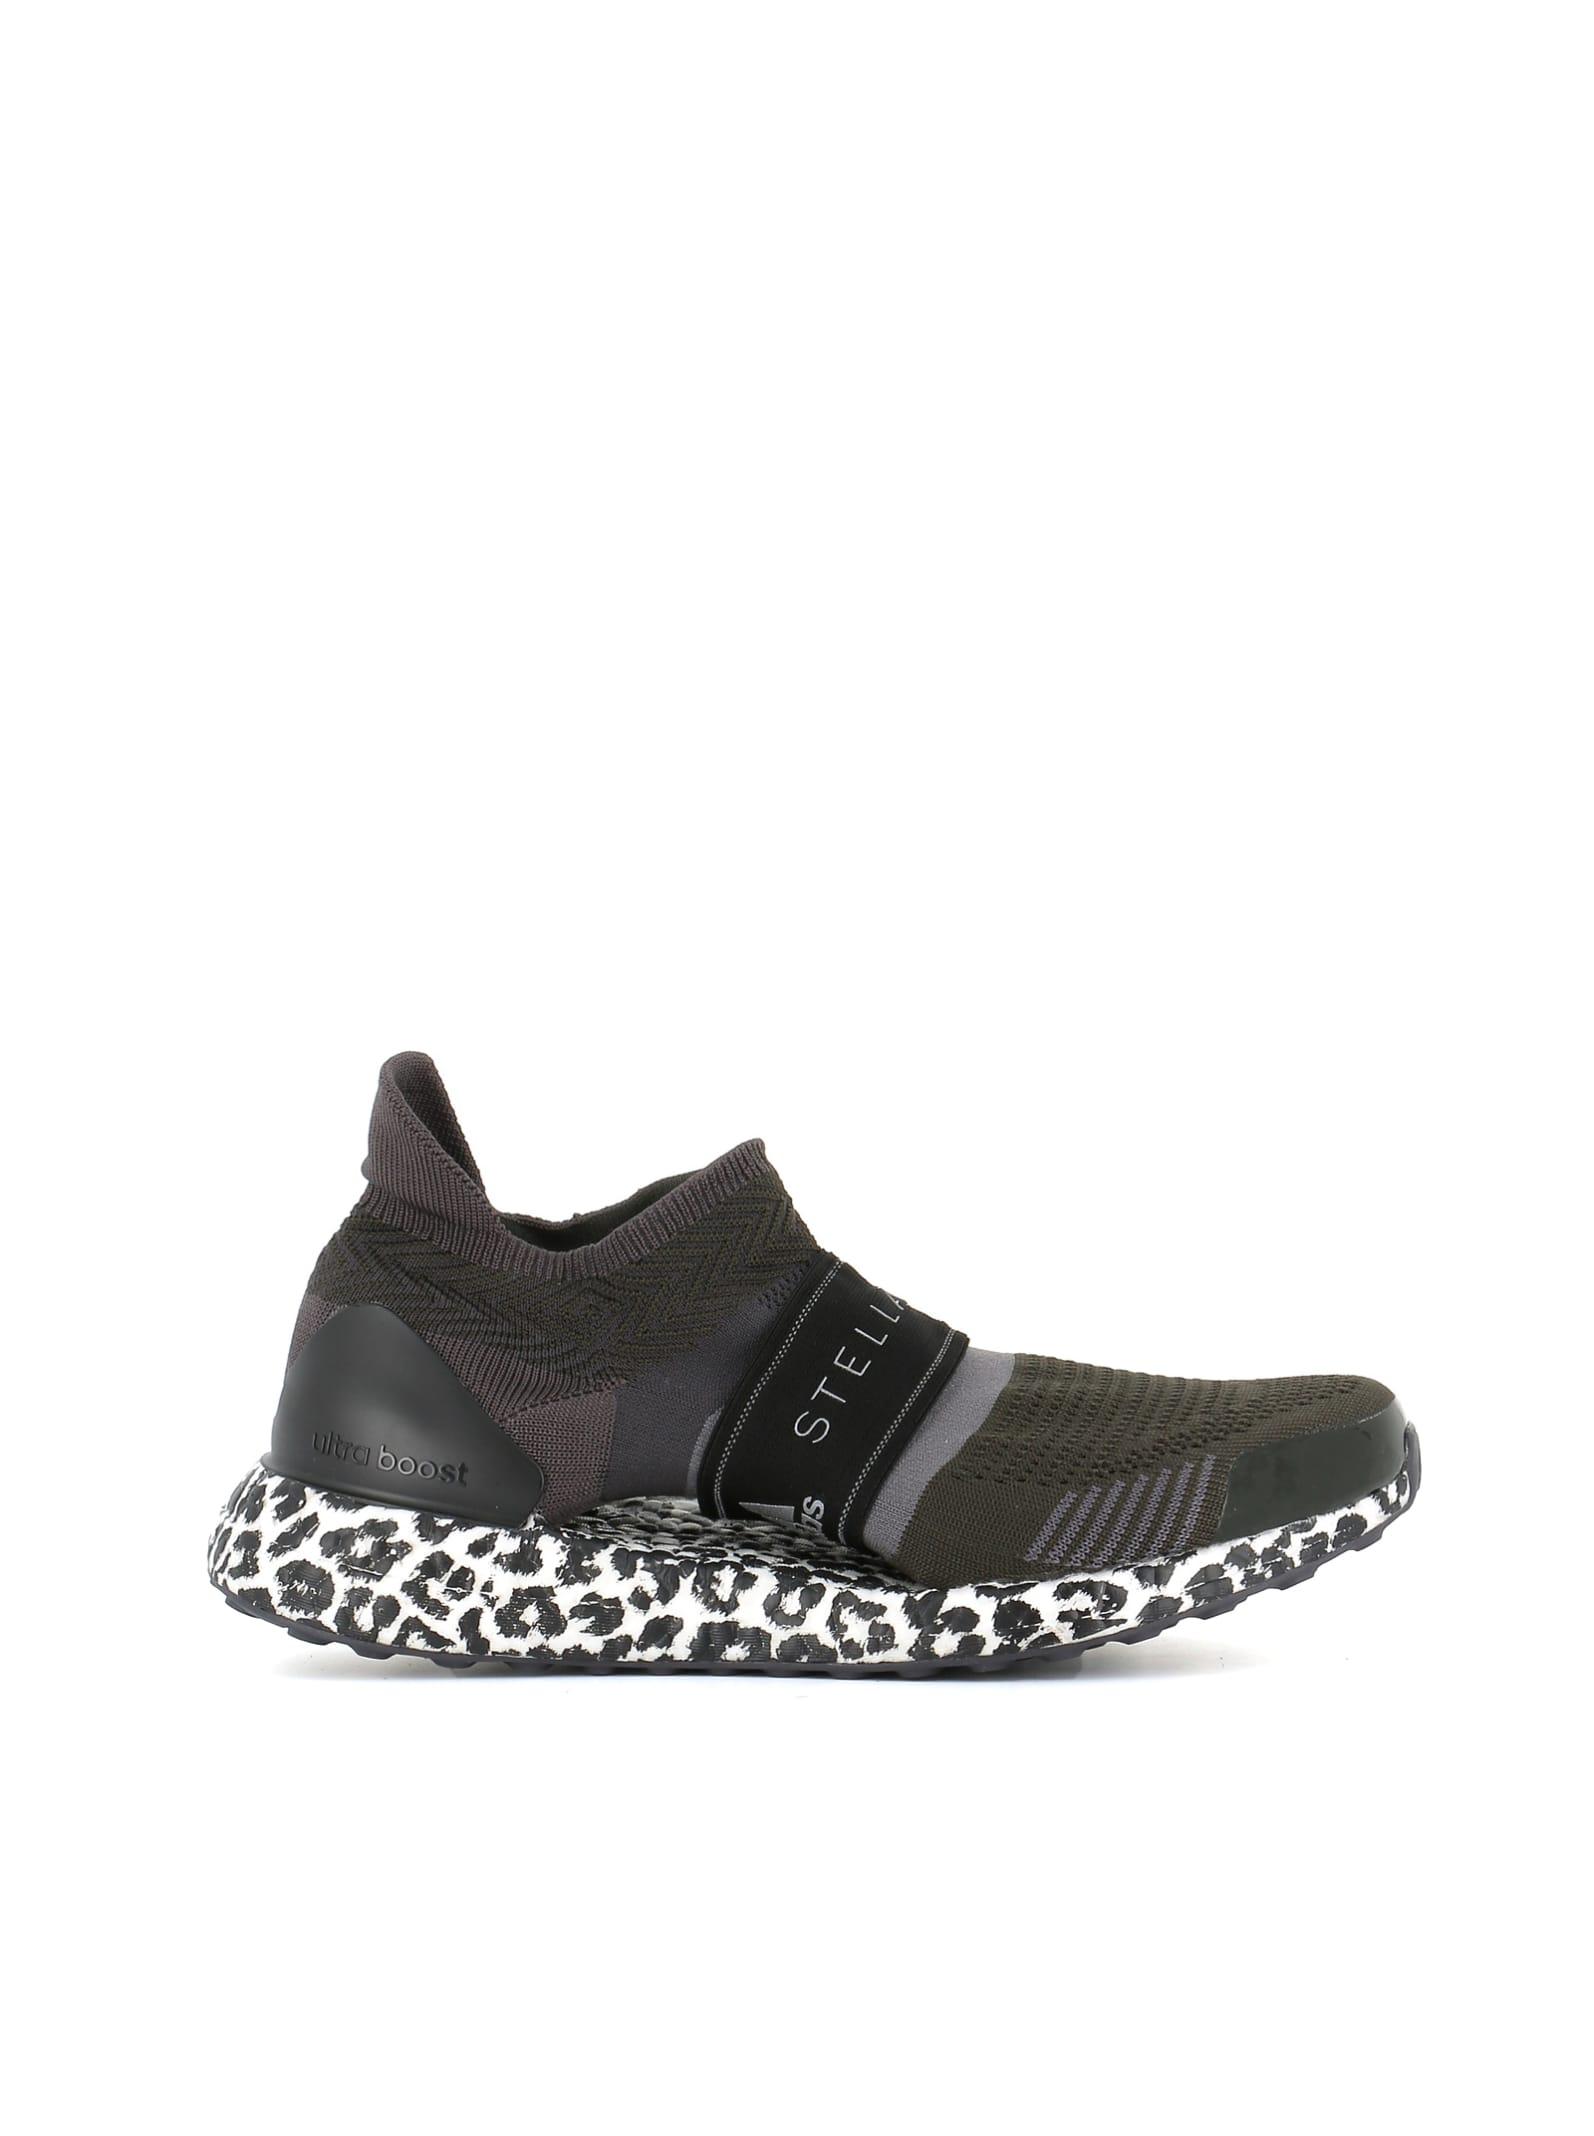 buy online 27594 bb0f6 Adidas By Stella Mccartney Sneakers